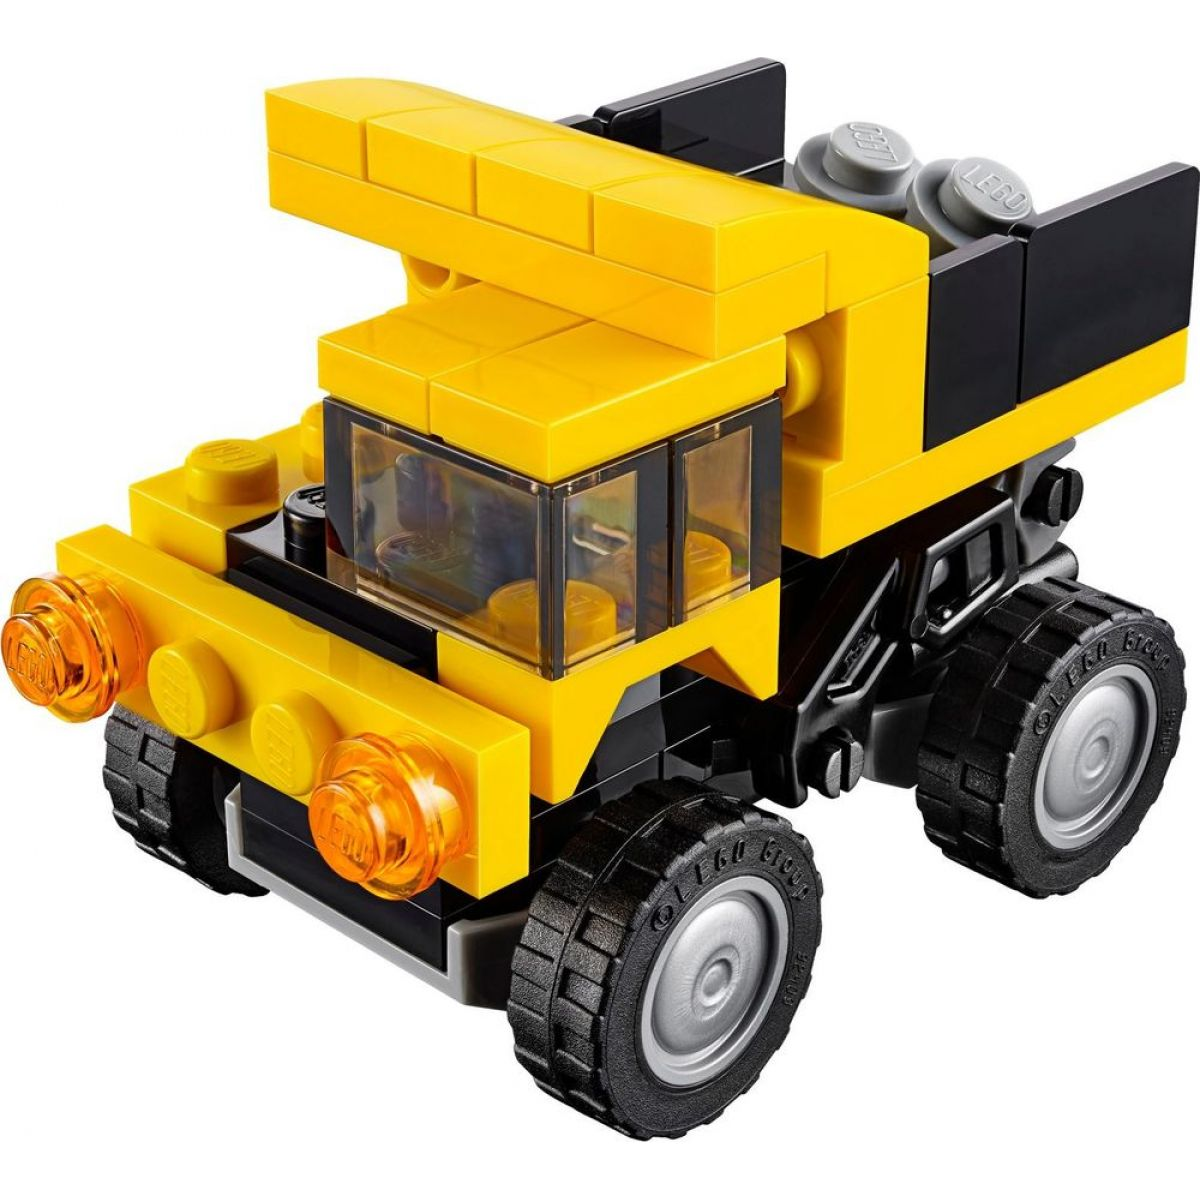 LEGO Creator 31041 Vozidla na stavbě #6